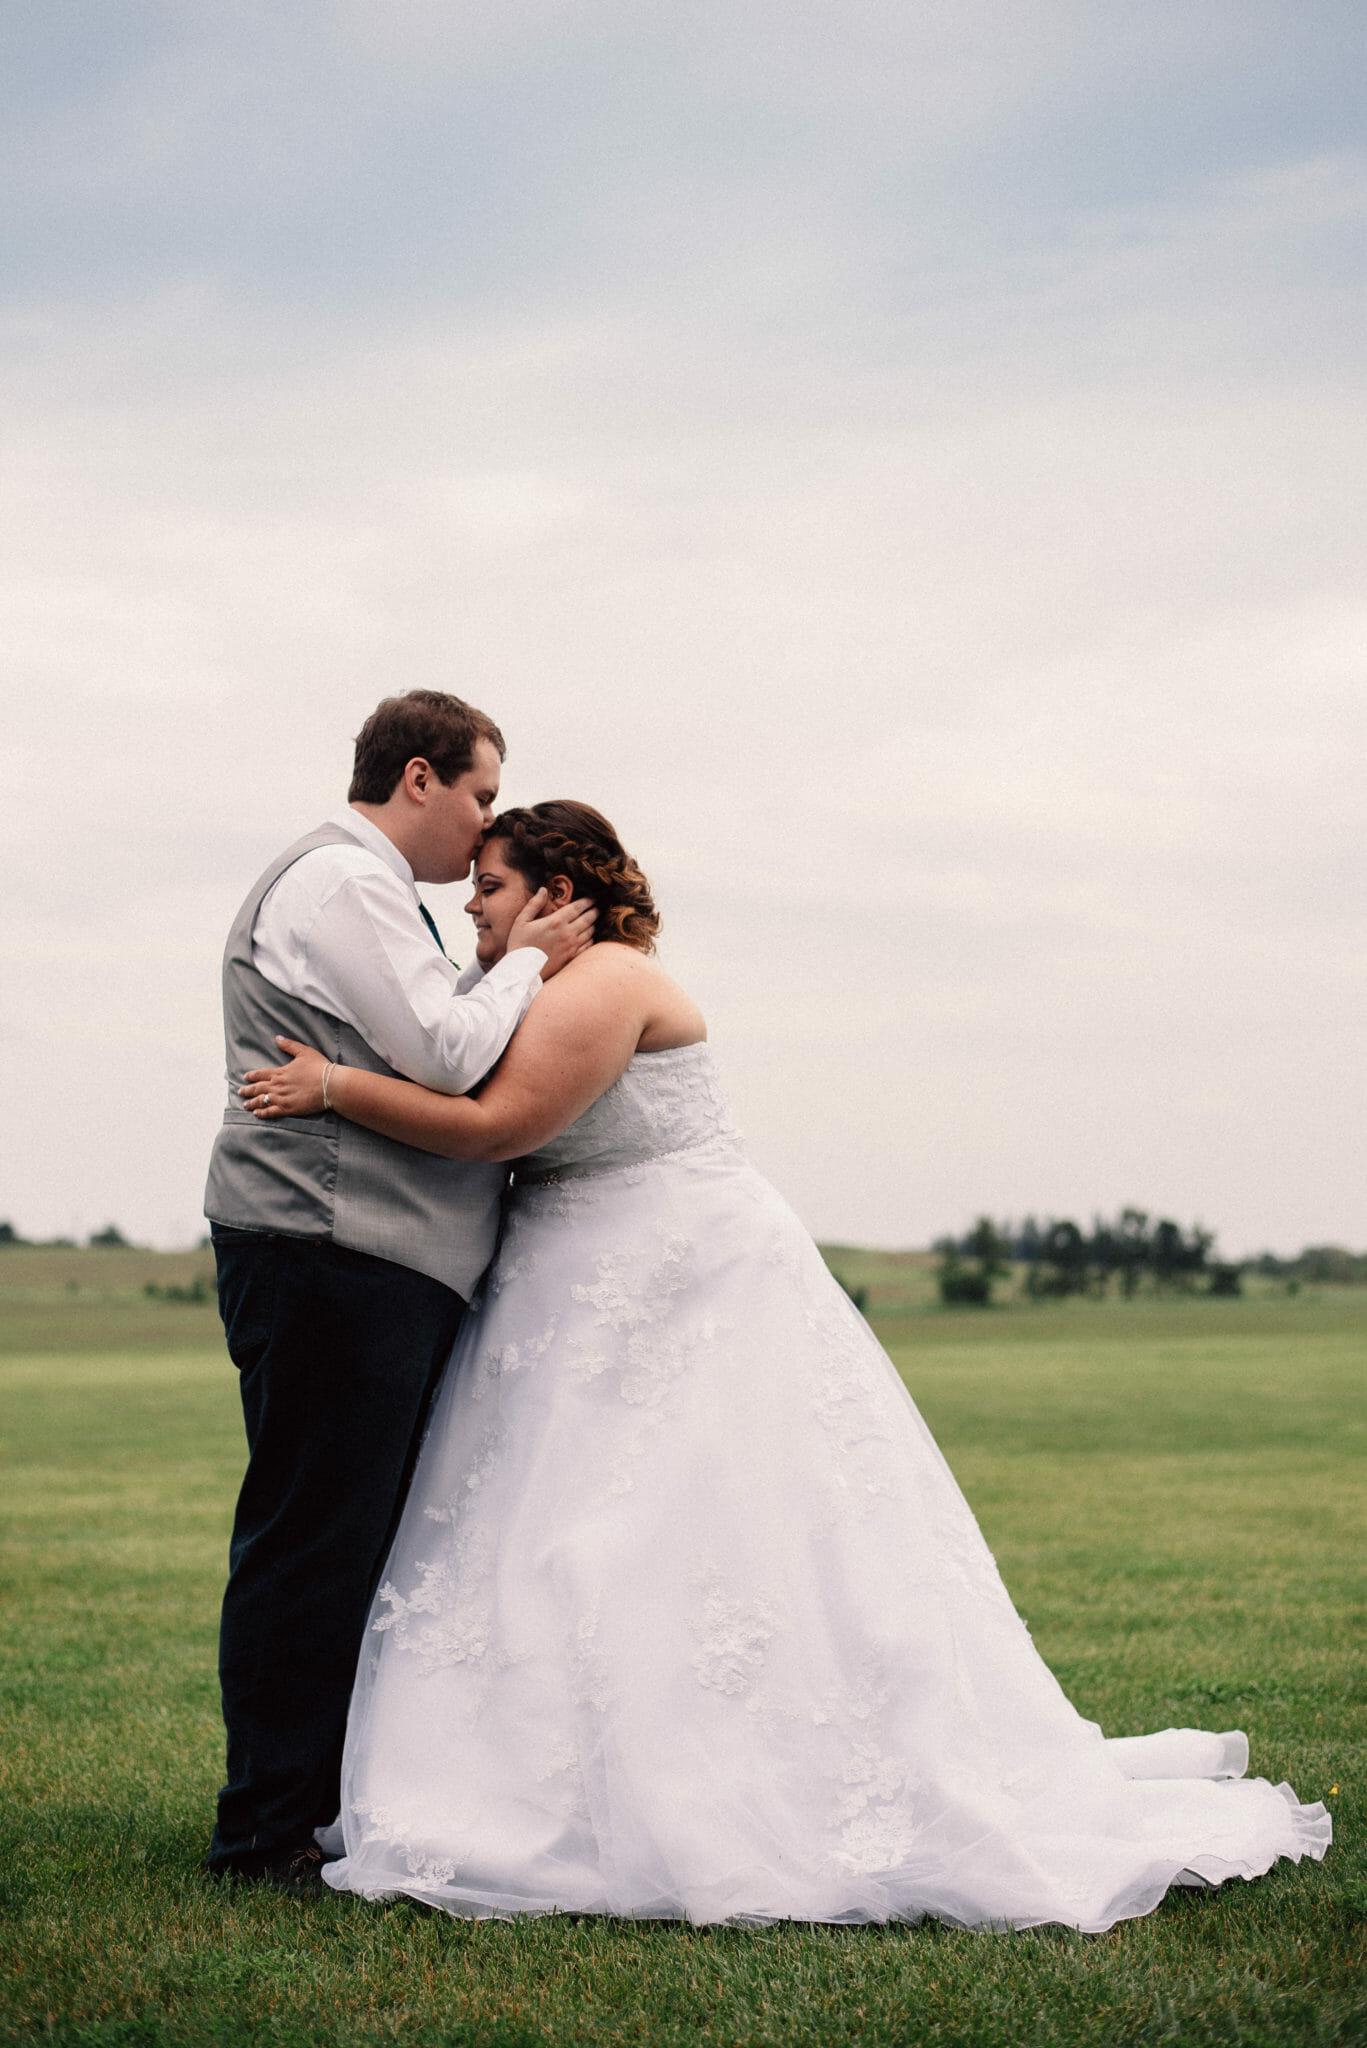 wedding photos at herongate wedding venue